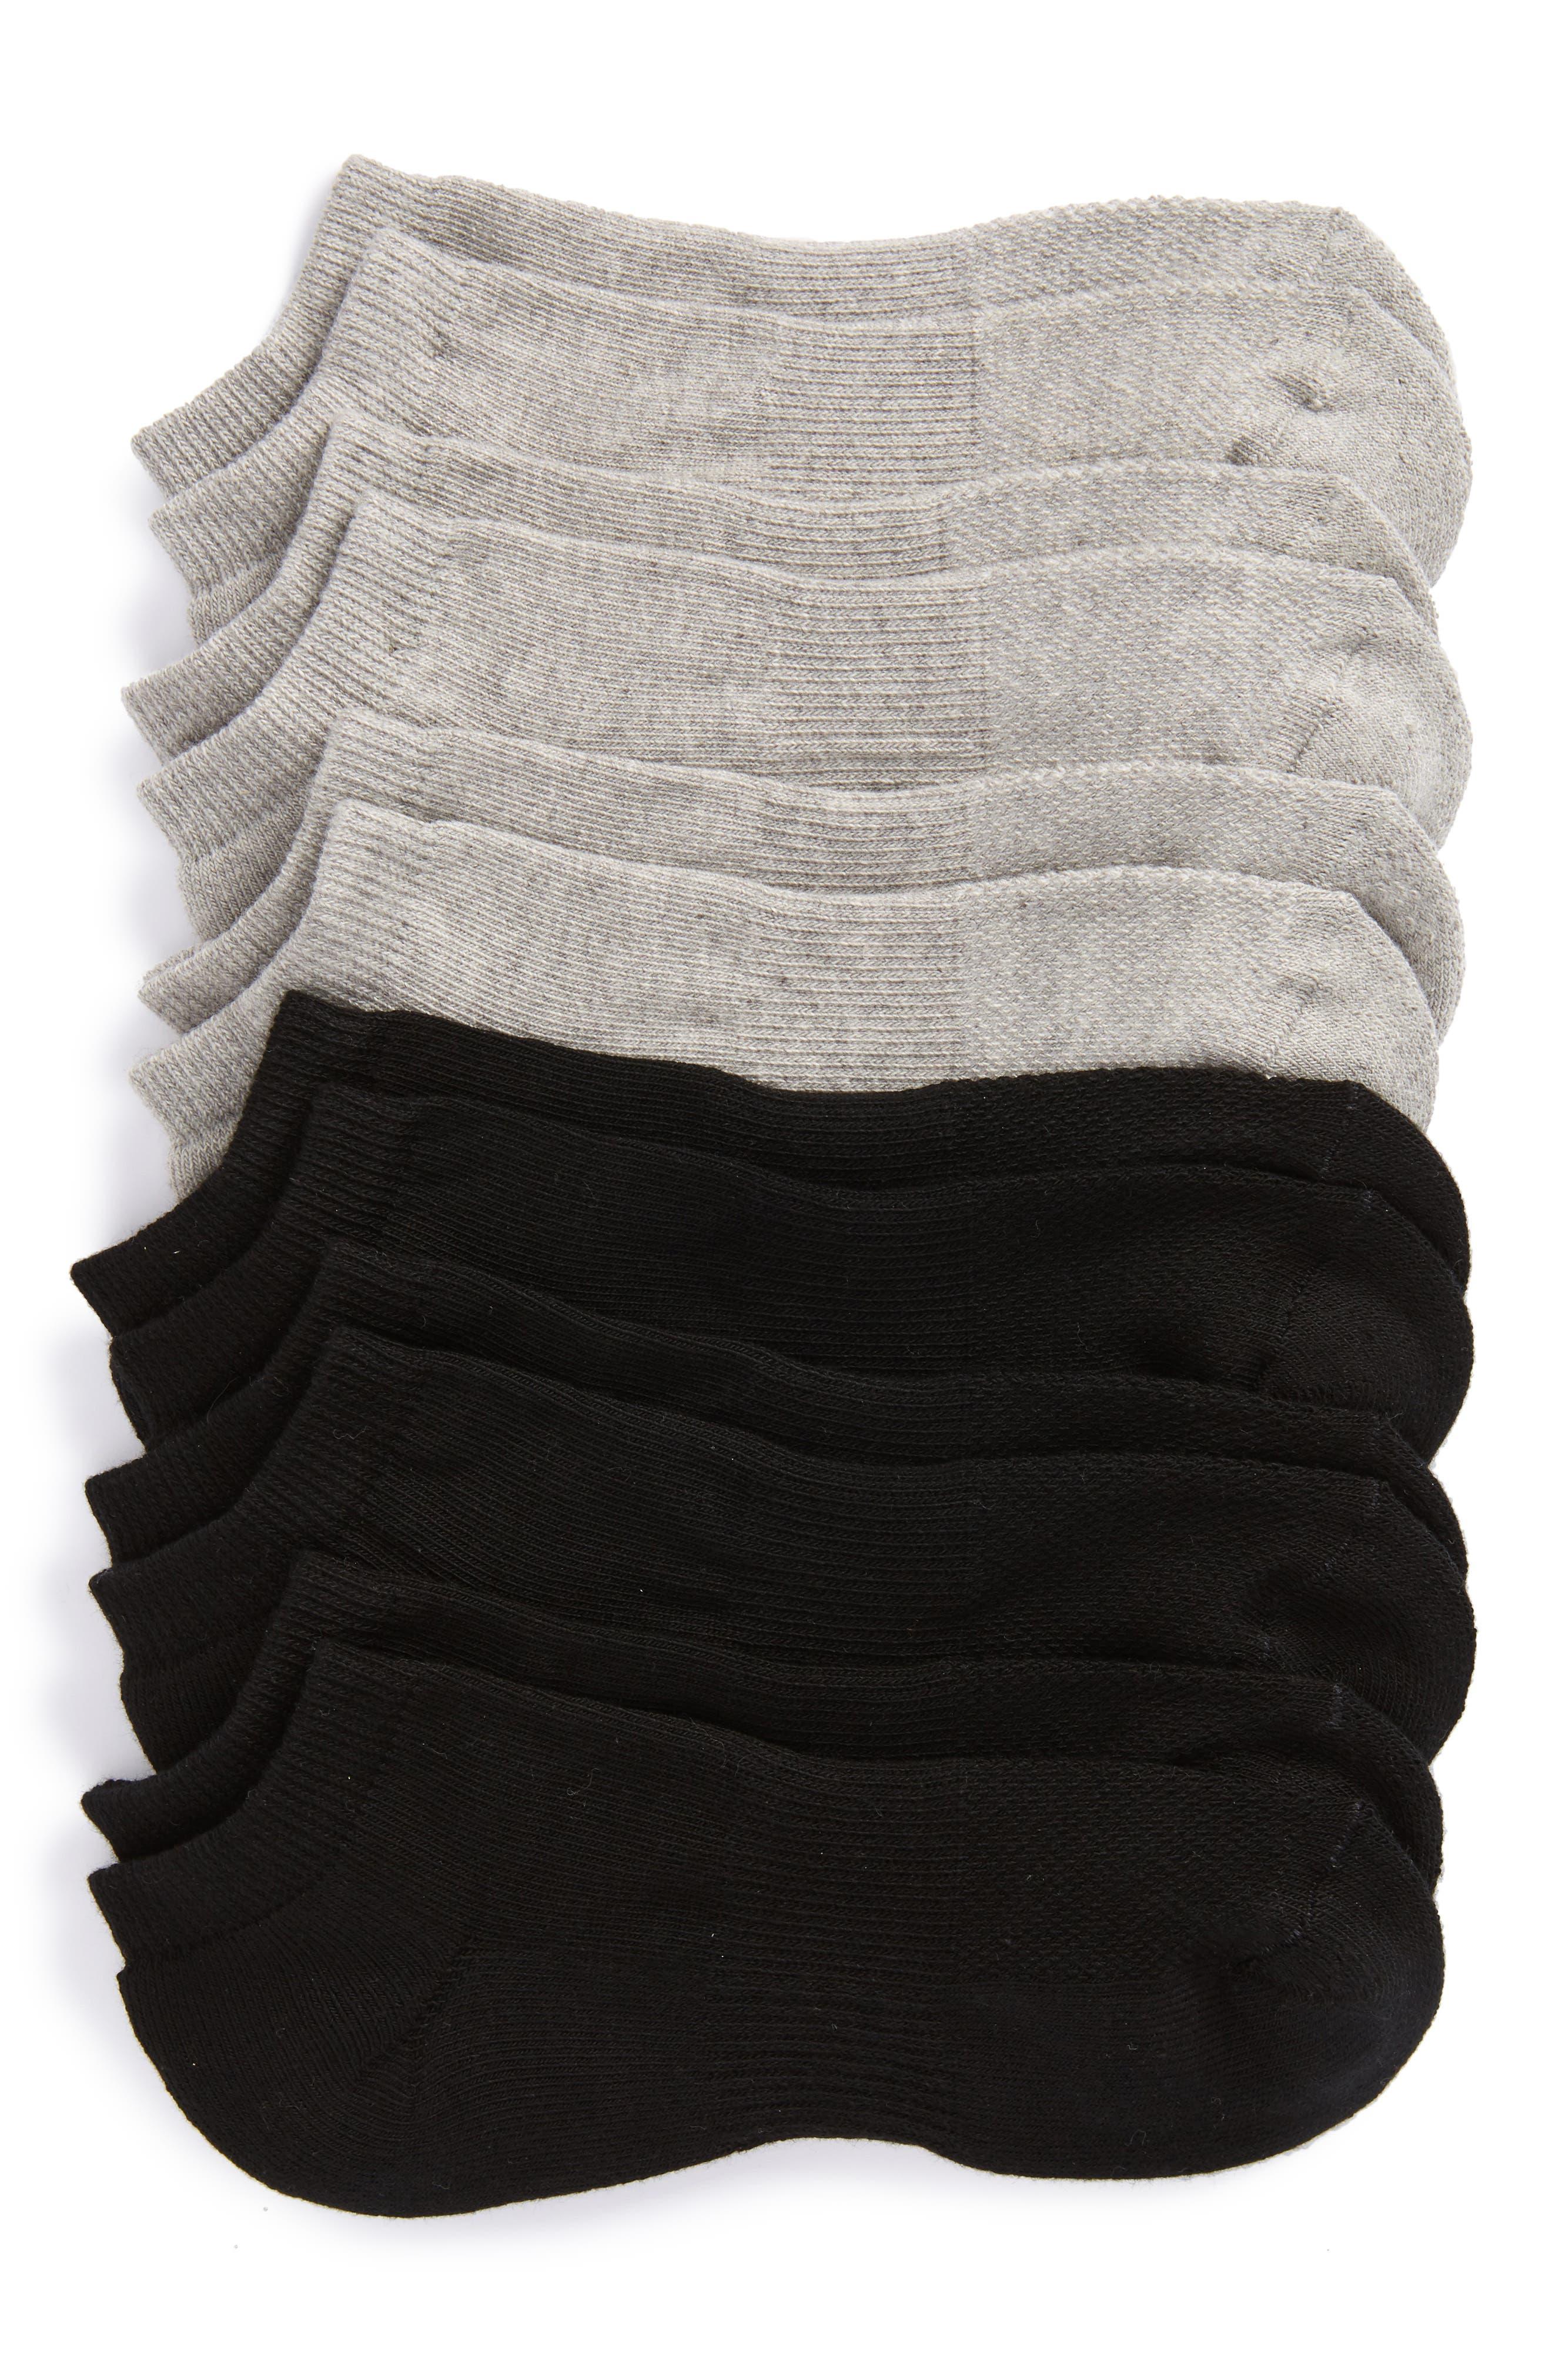 6-Pack Athletic No-Show Socks,                         Main,                         color, Black/ Grey